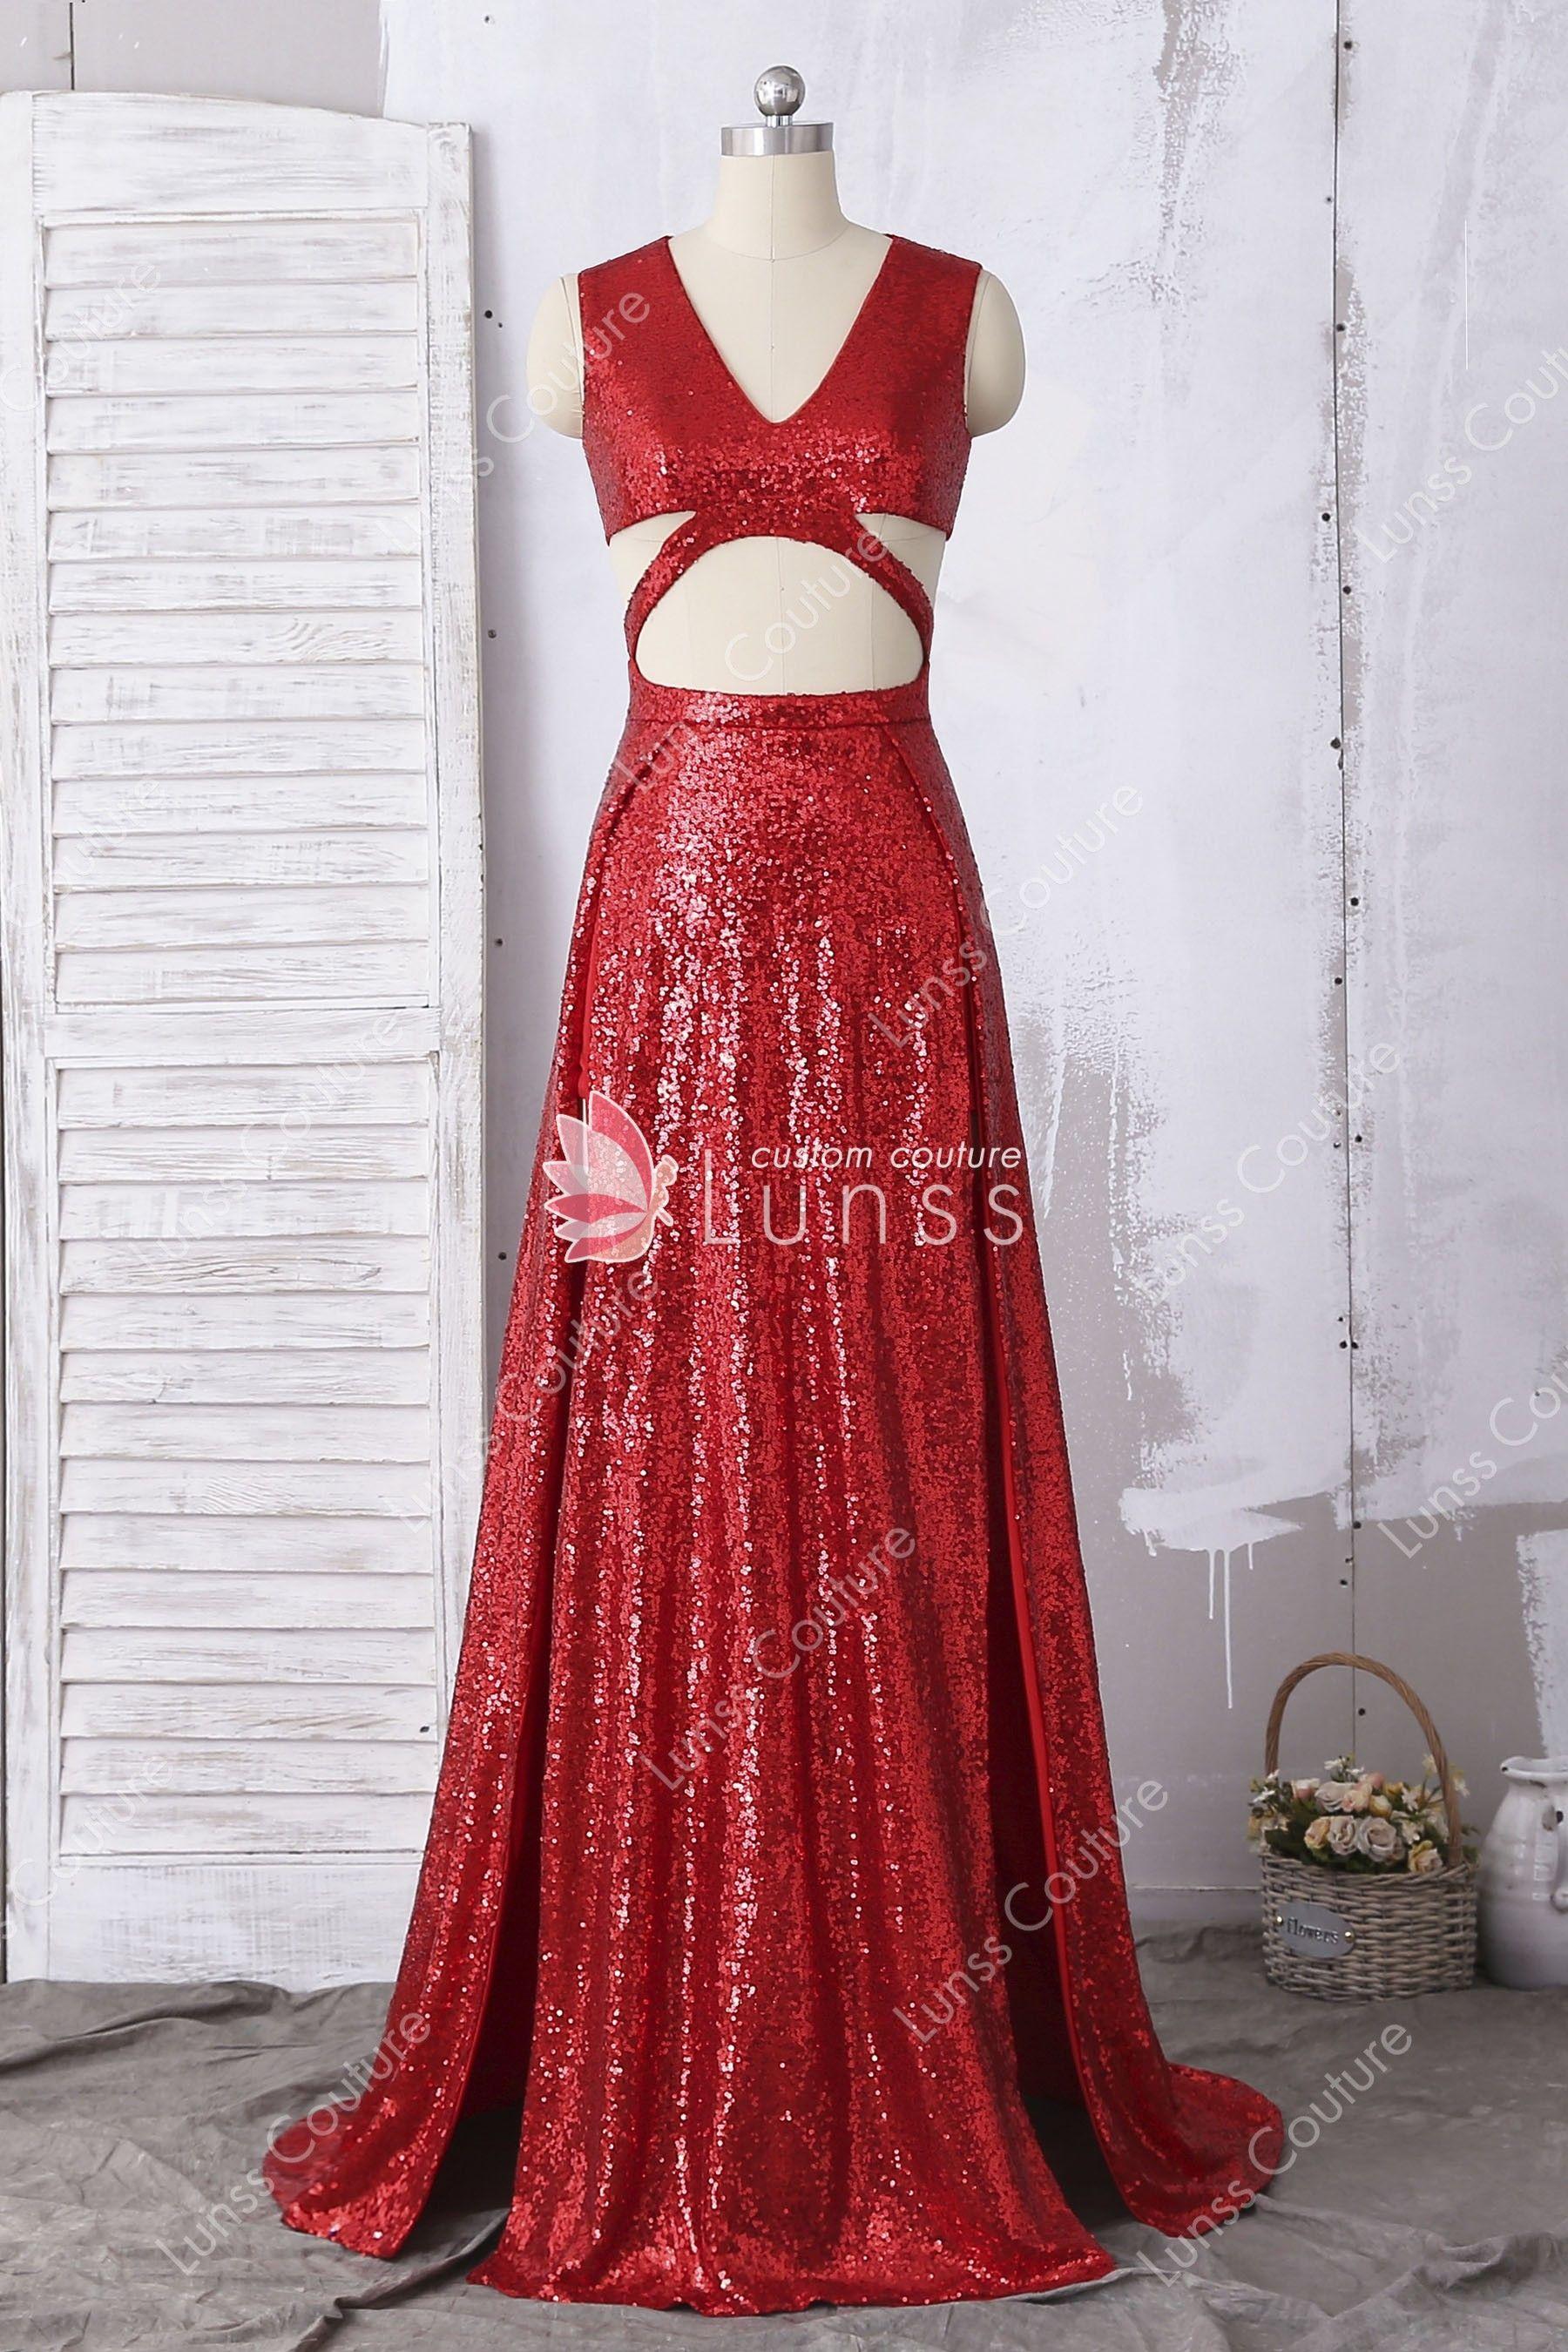 36e14f94f40 Unique Sparkly Sleeveless V-neck Cutout High Slits Red Sequin A-line Prom  Dress